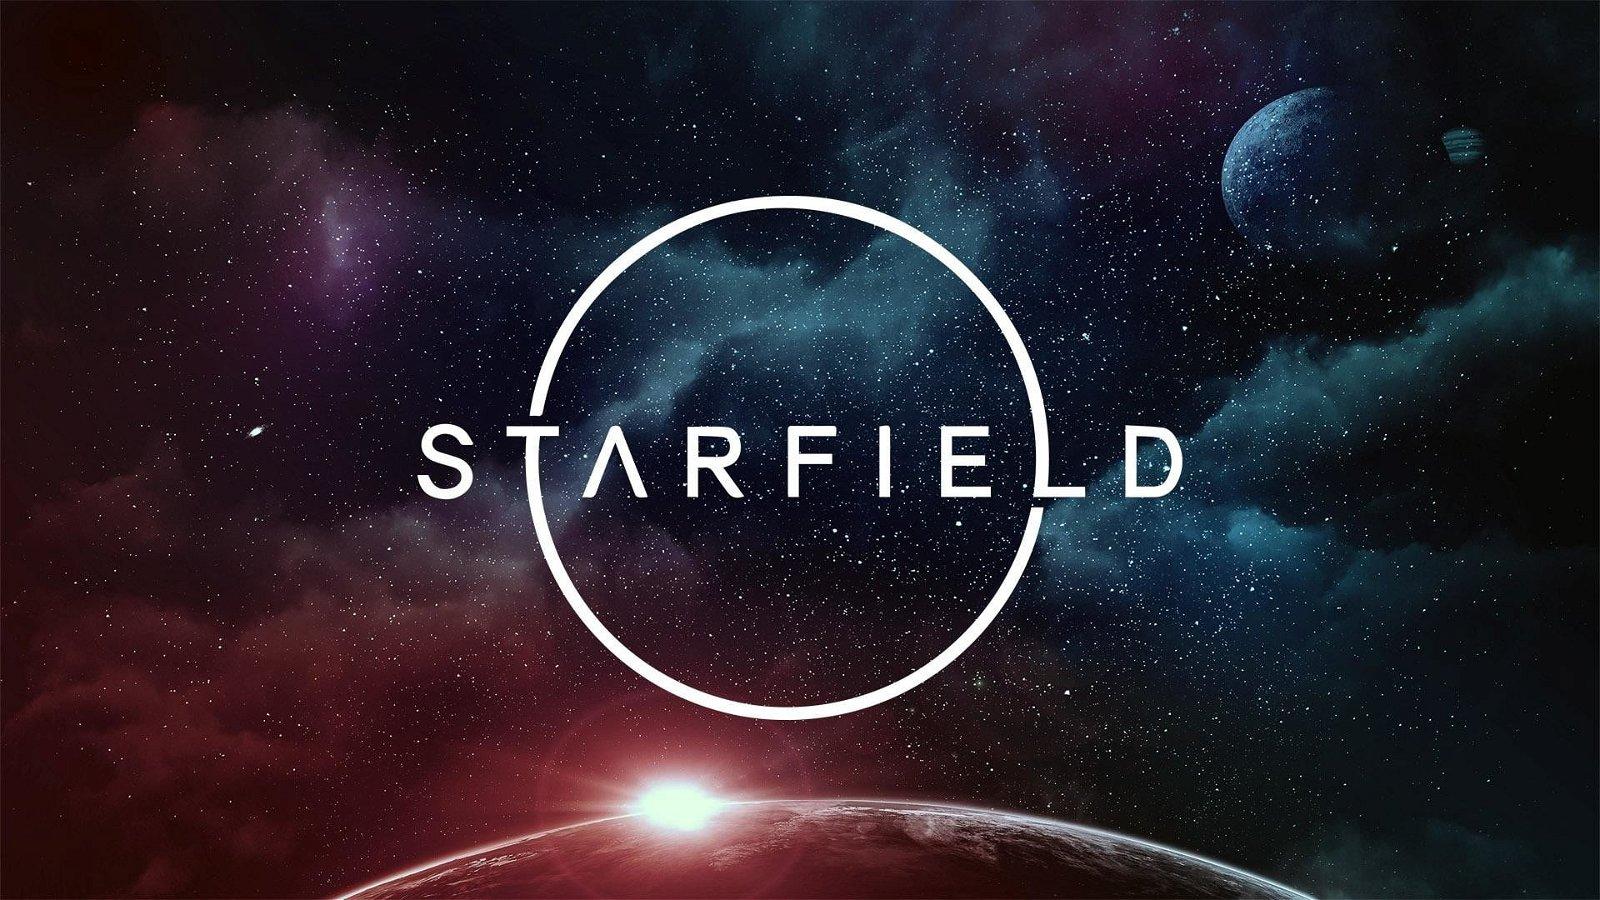 Todd Howard Teases Starfield and Elder Scrolls 6 3